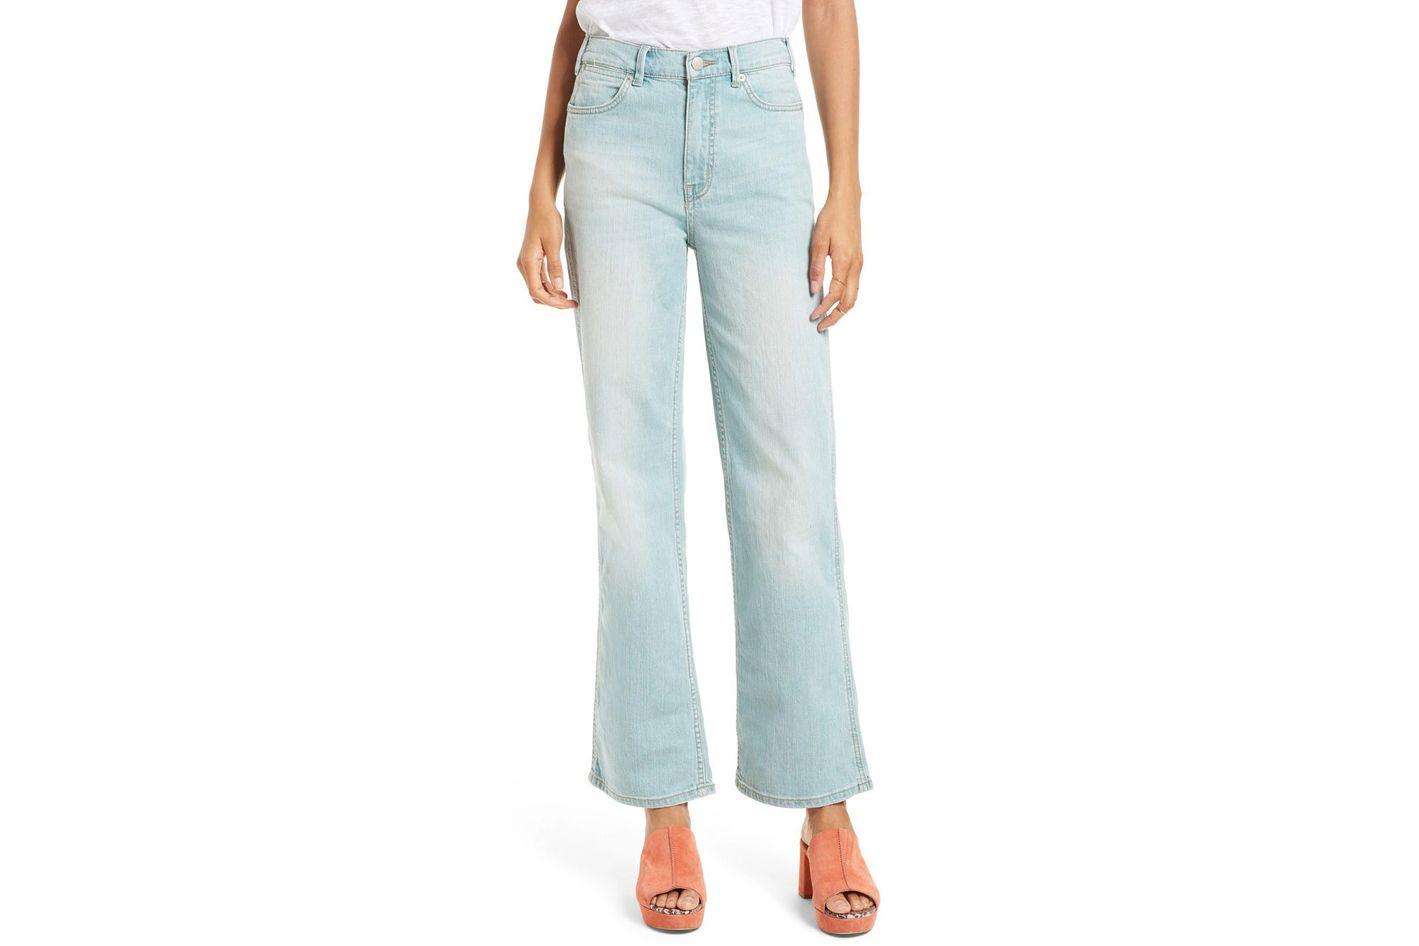 Free People High Waist Flare Leg Jeans